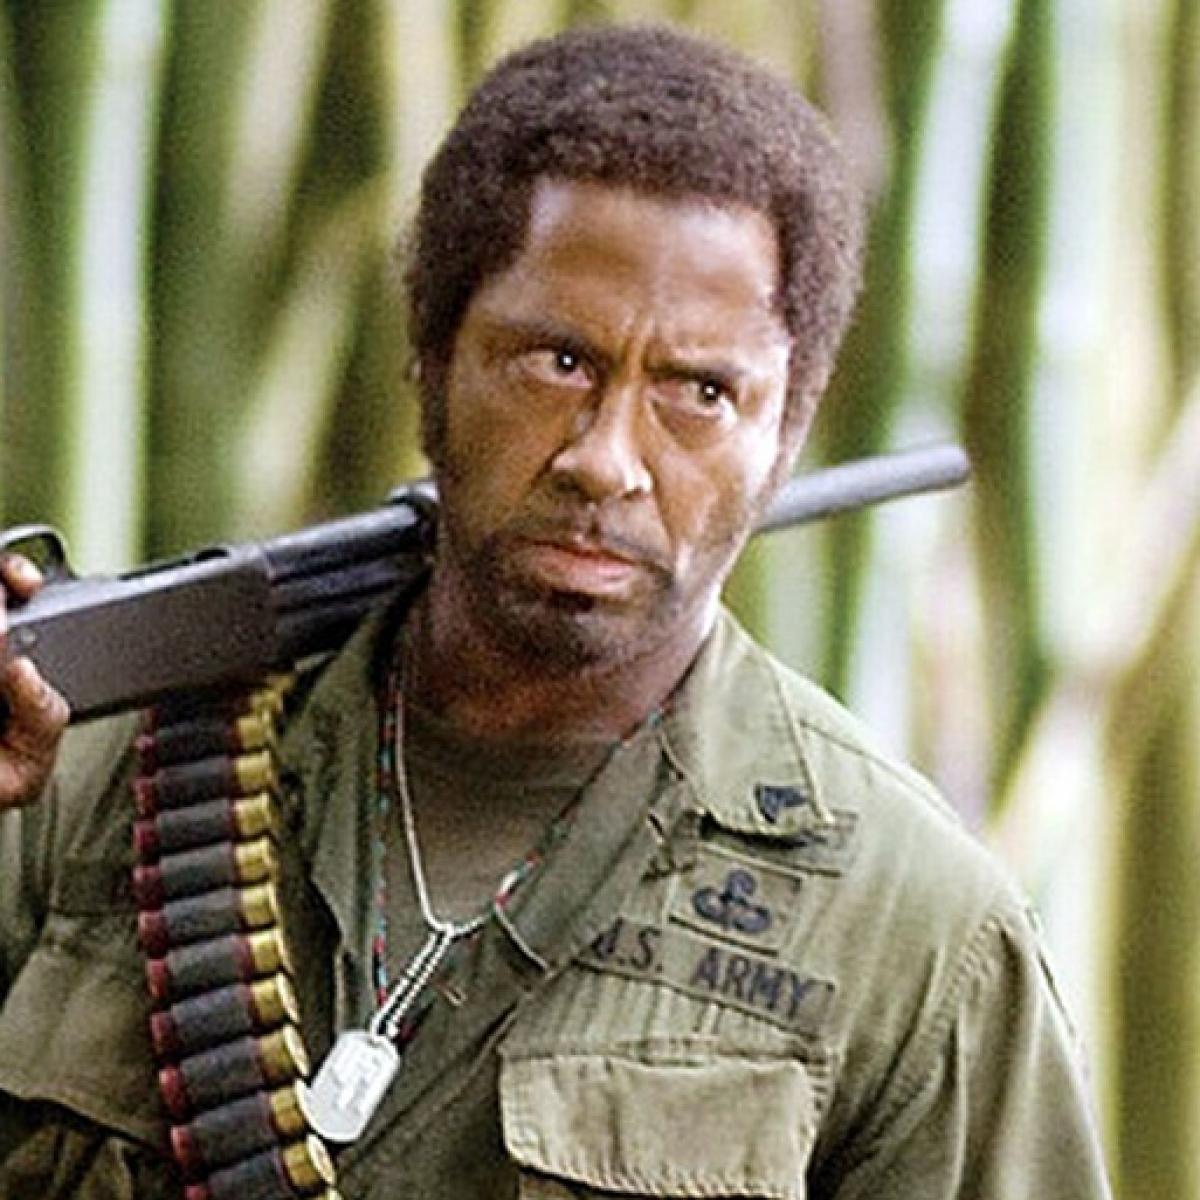 Robert Downey Jr defends wearing blackface in 2008 film 'Tropic Thunder'